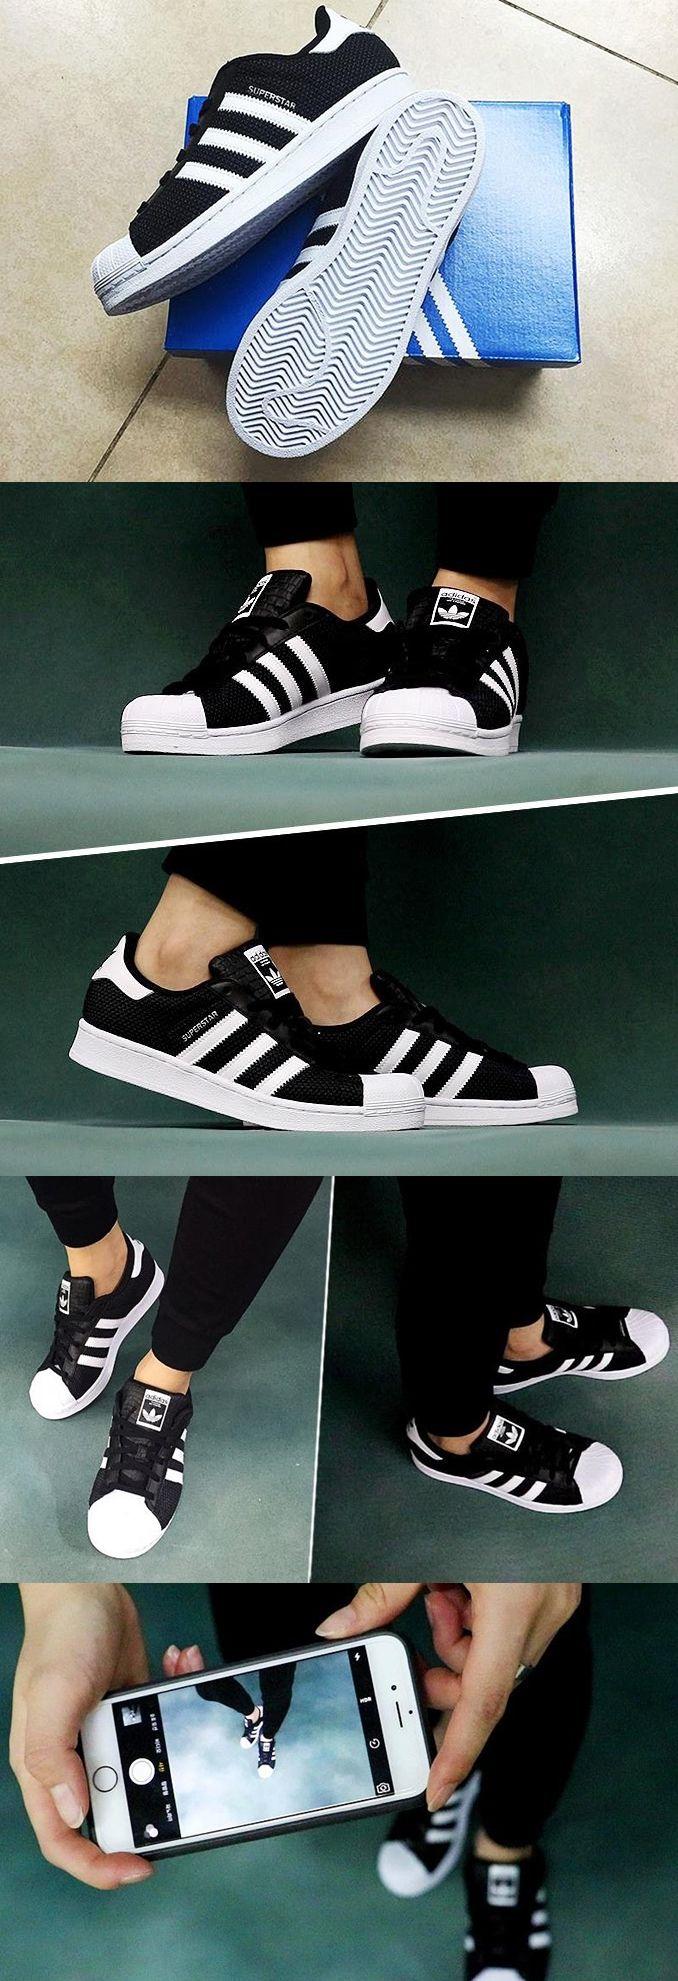 #adidas #아디다스 #슈퍼스타 #오리지널 #신상 #SUPERSTAR #ADIDASSUPERSTAR #신발추천 #오늘뭐신지 #신발 #스니커즈 #교복 #세일 #할인 #플레이어 #player